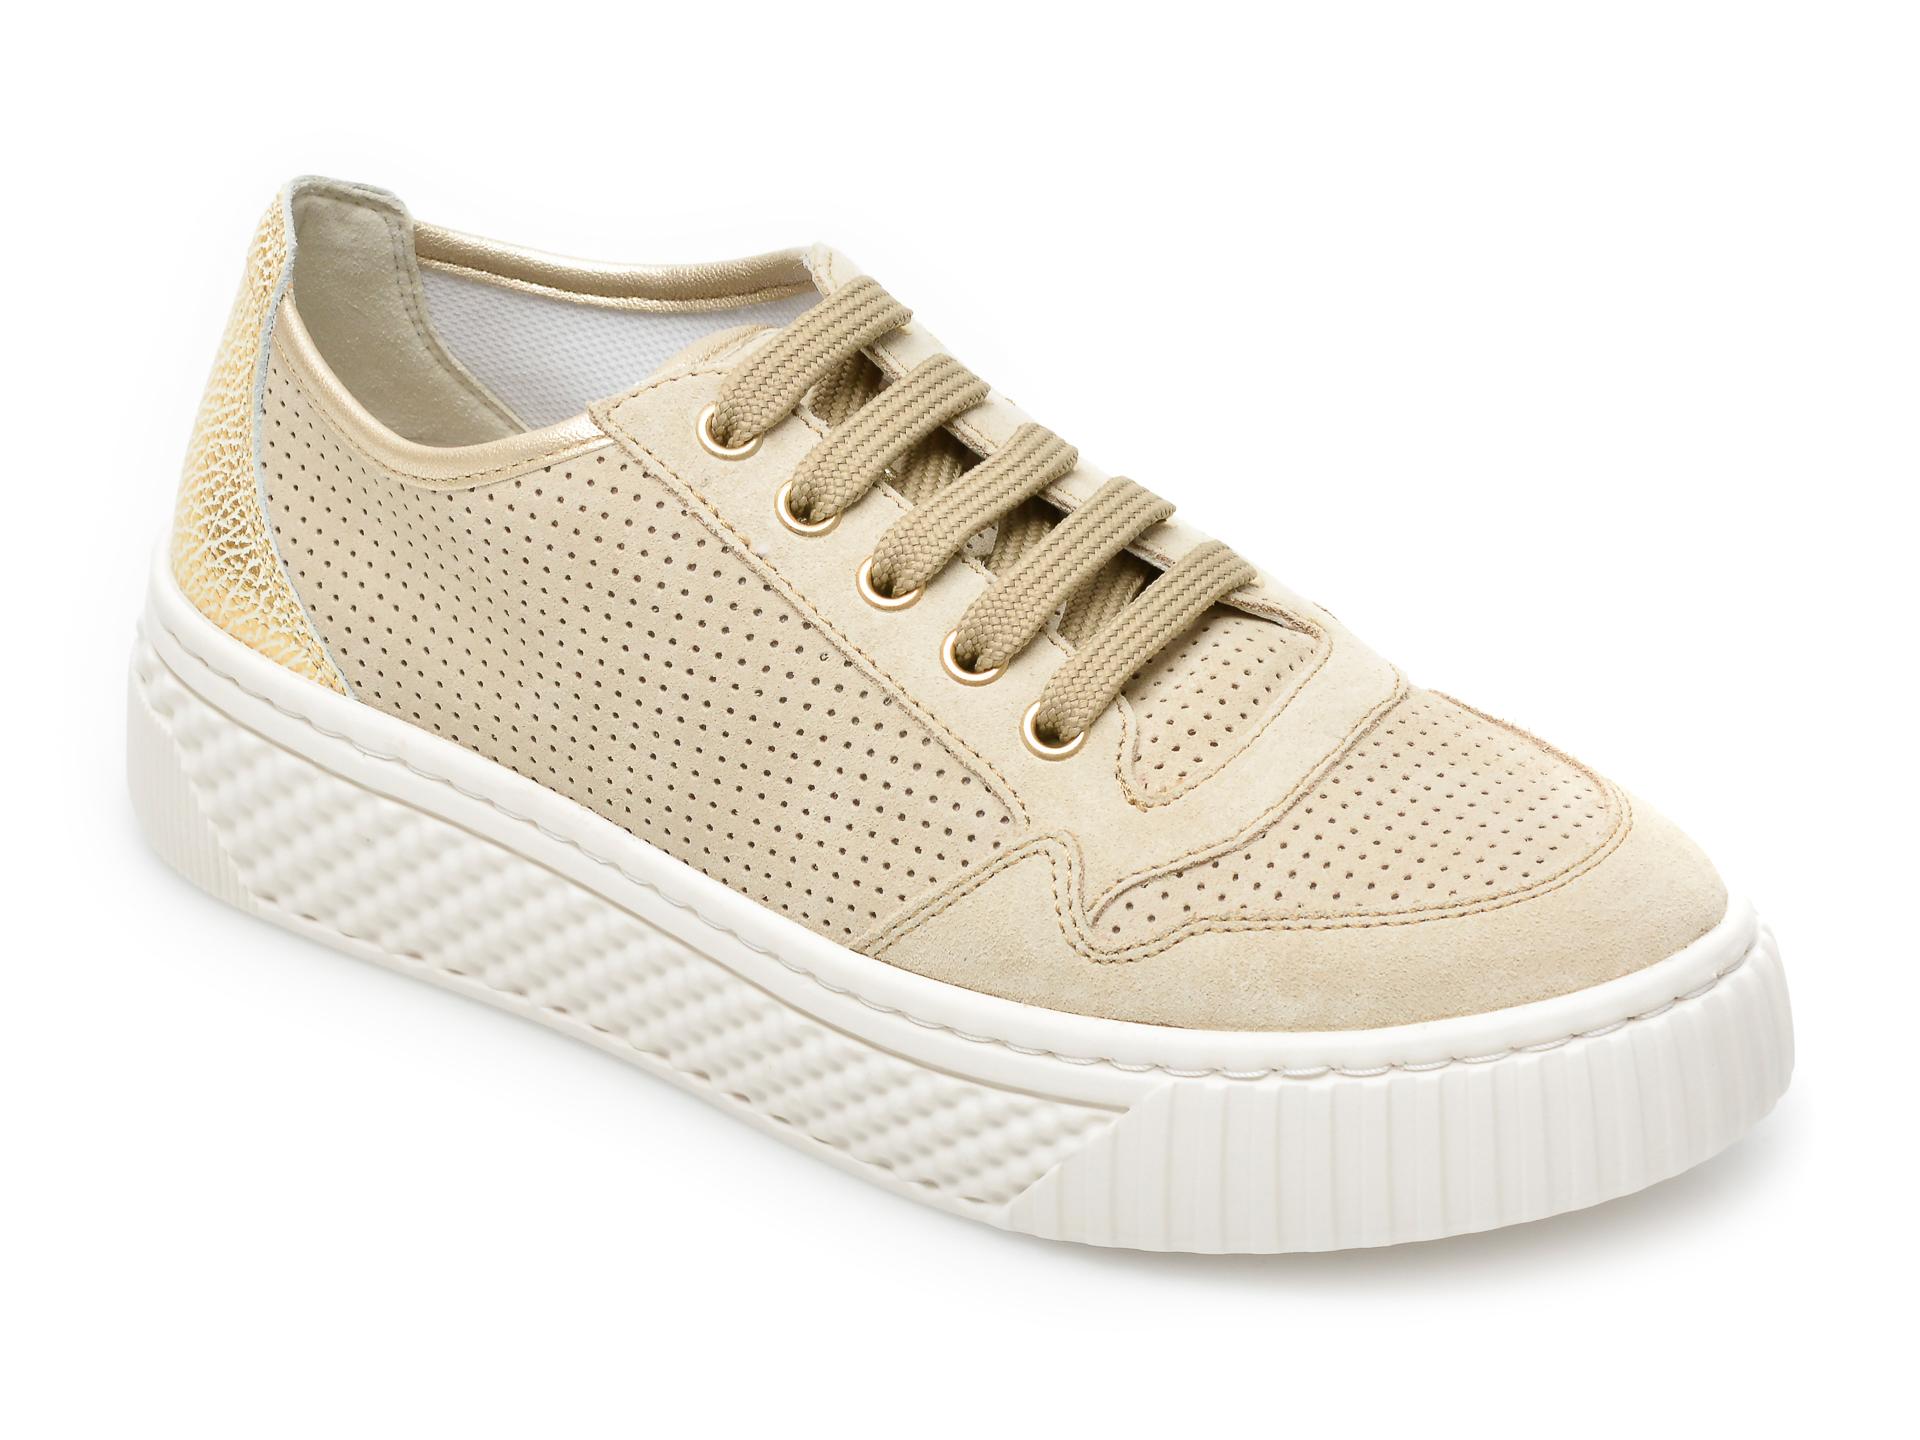 Pantofi sport GEOX bej, D15HSA, din piele intoarsa New